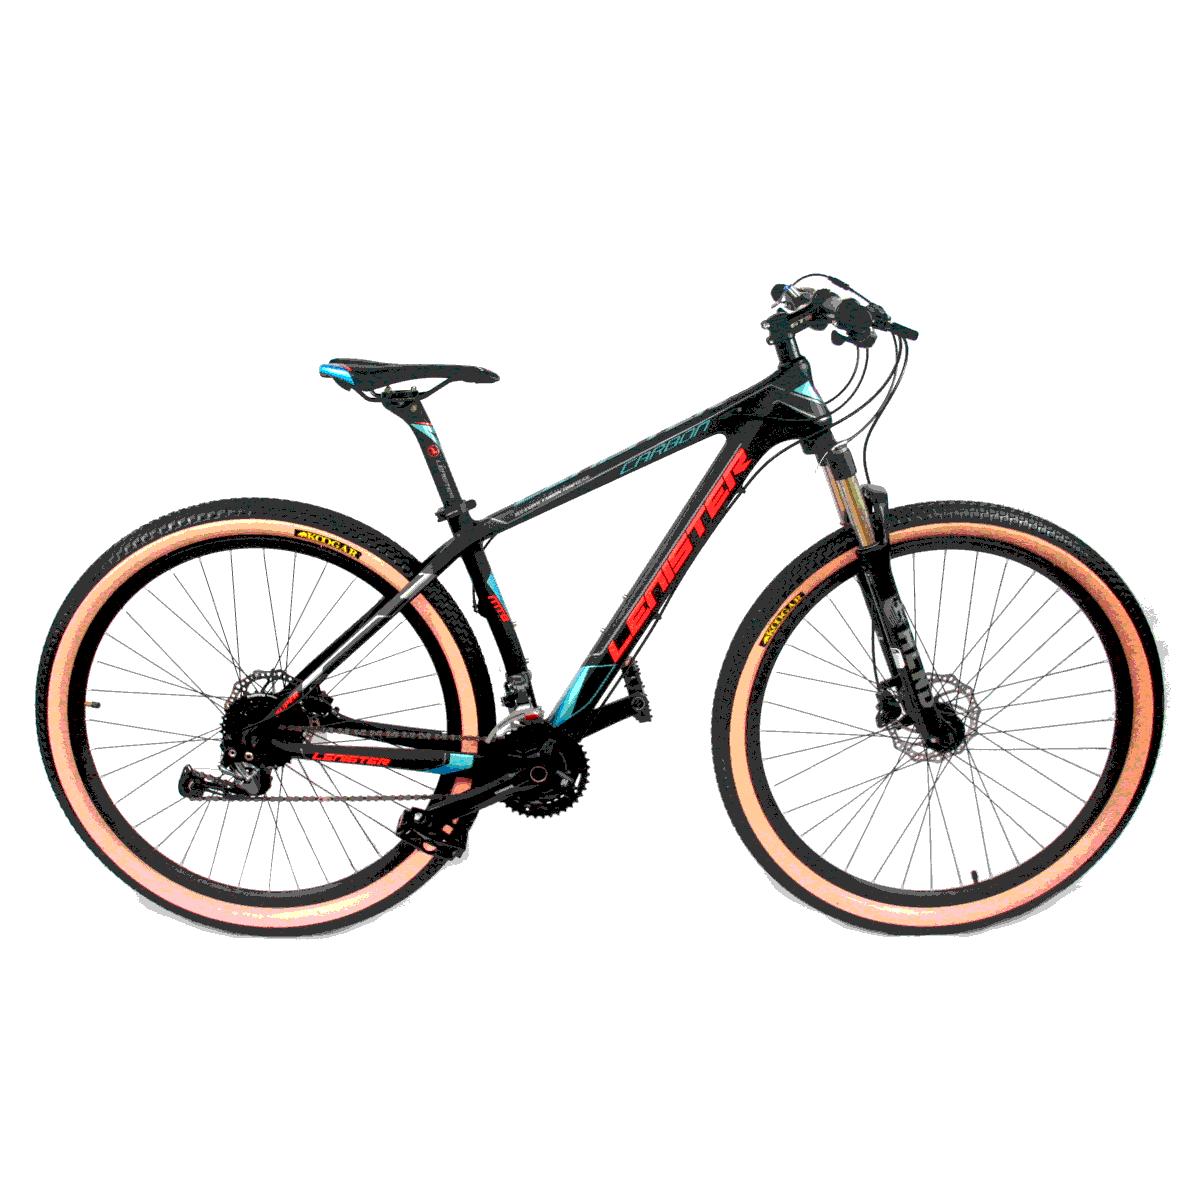 Bicicleta Aro 29 Mtb Redstone Lenister Carbon 27v Preto